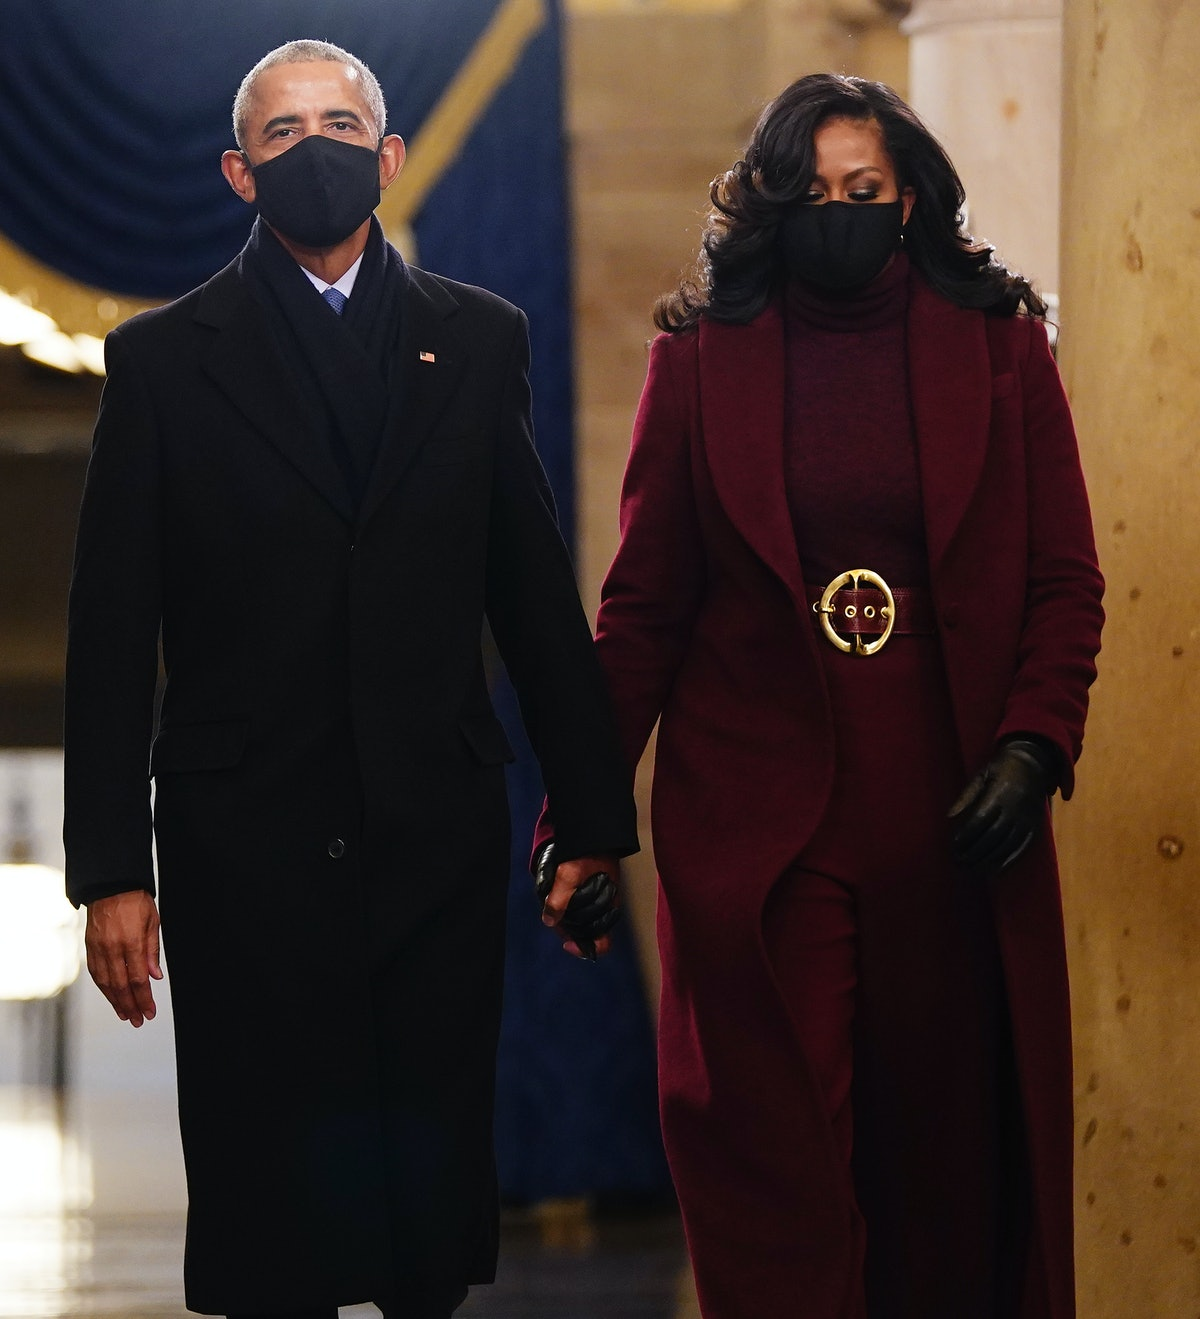 WASHINGTON, DC - JANUARY 20: Former US President Barack Obama (L) and Michelle Obama arrive in the C...